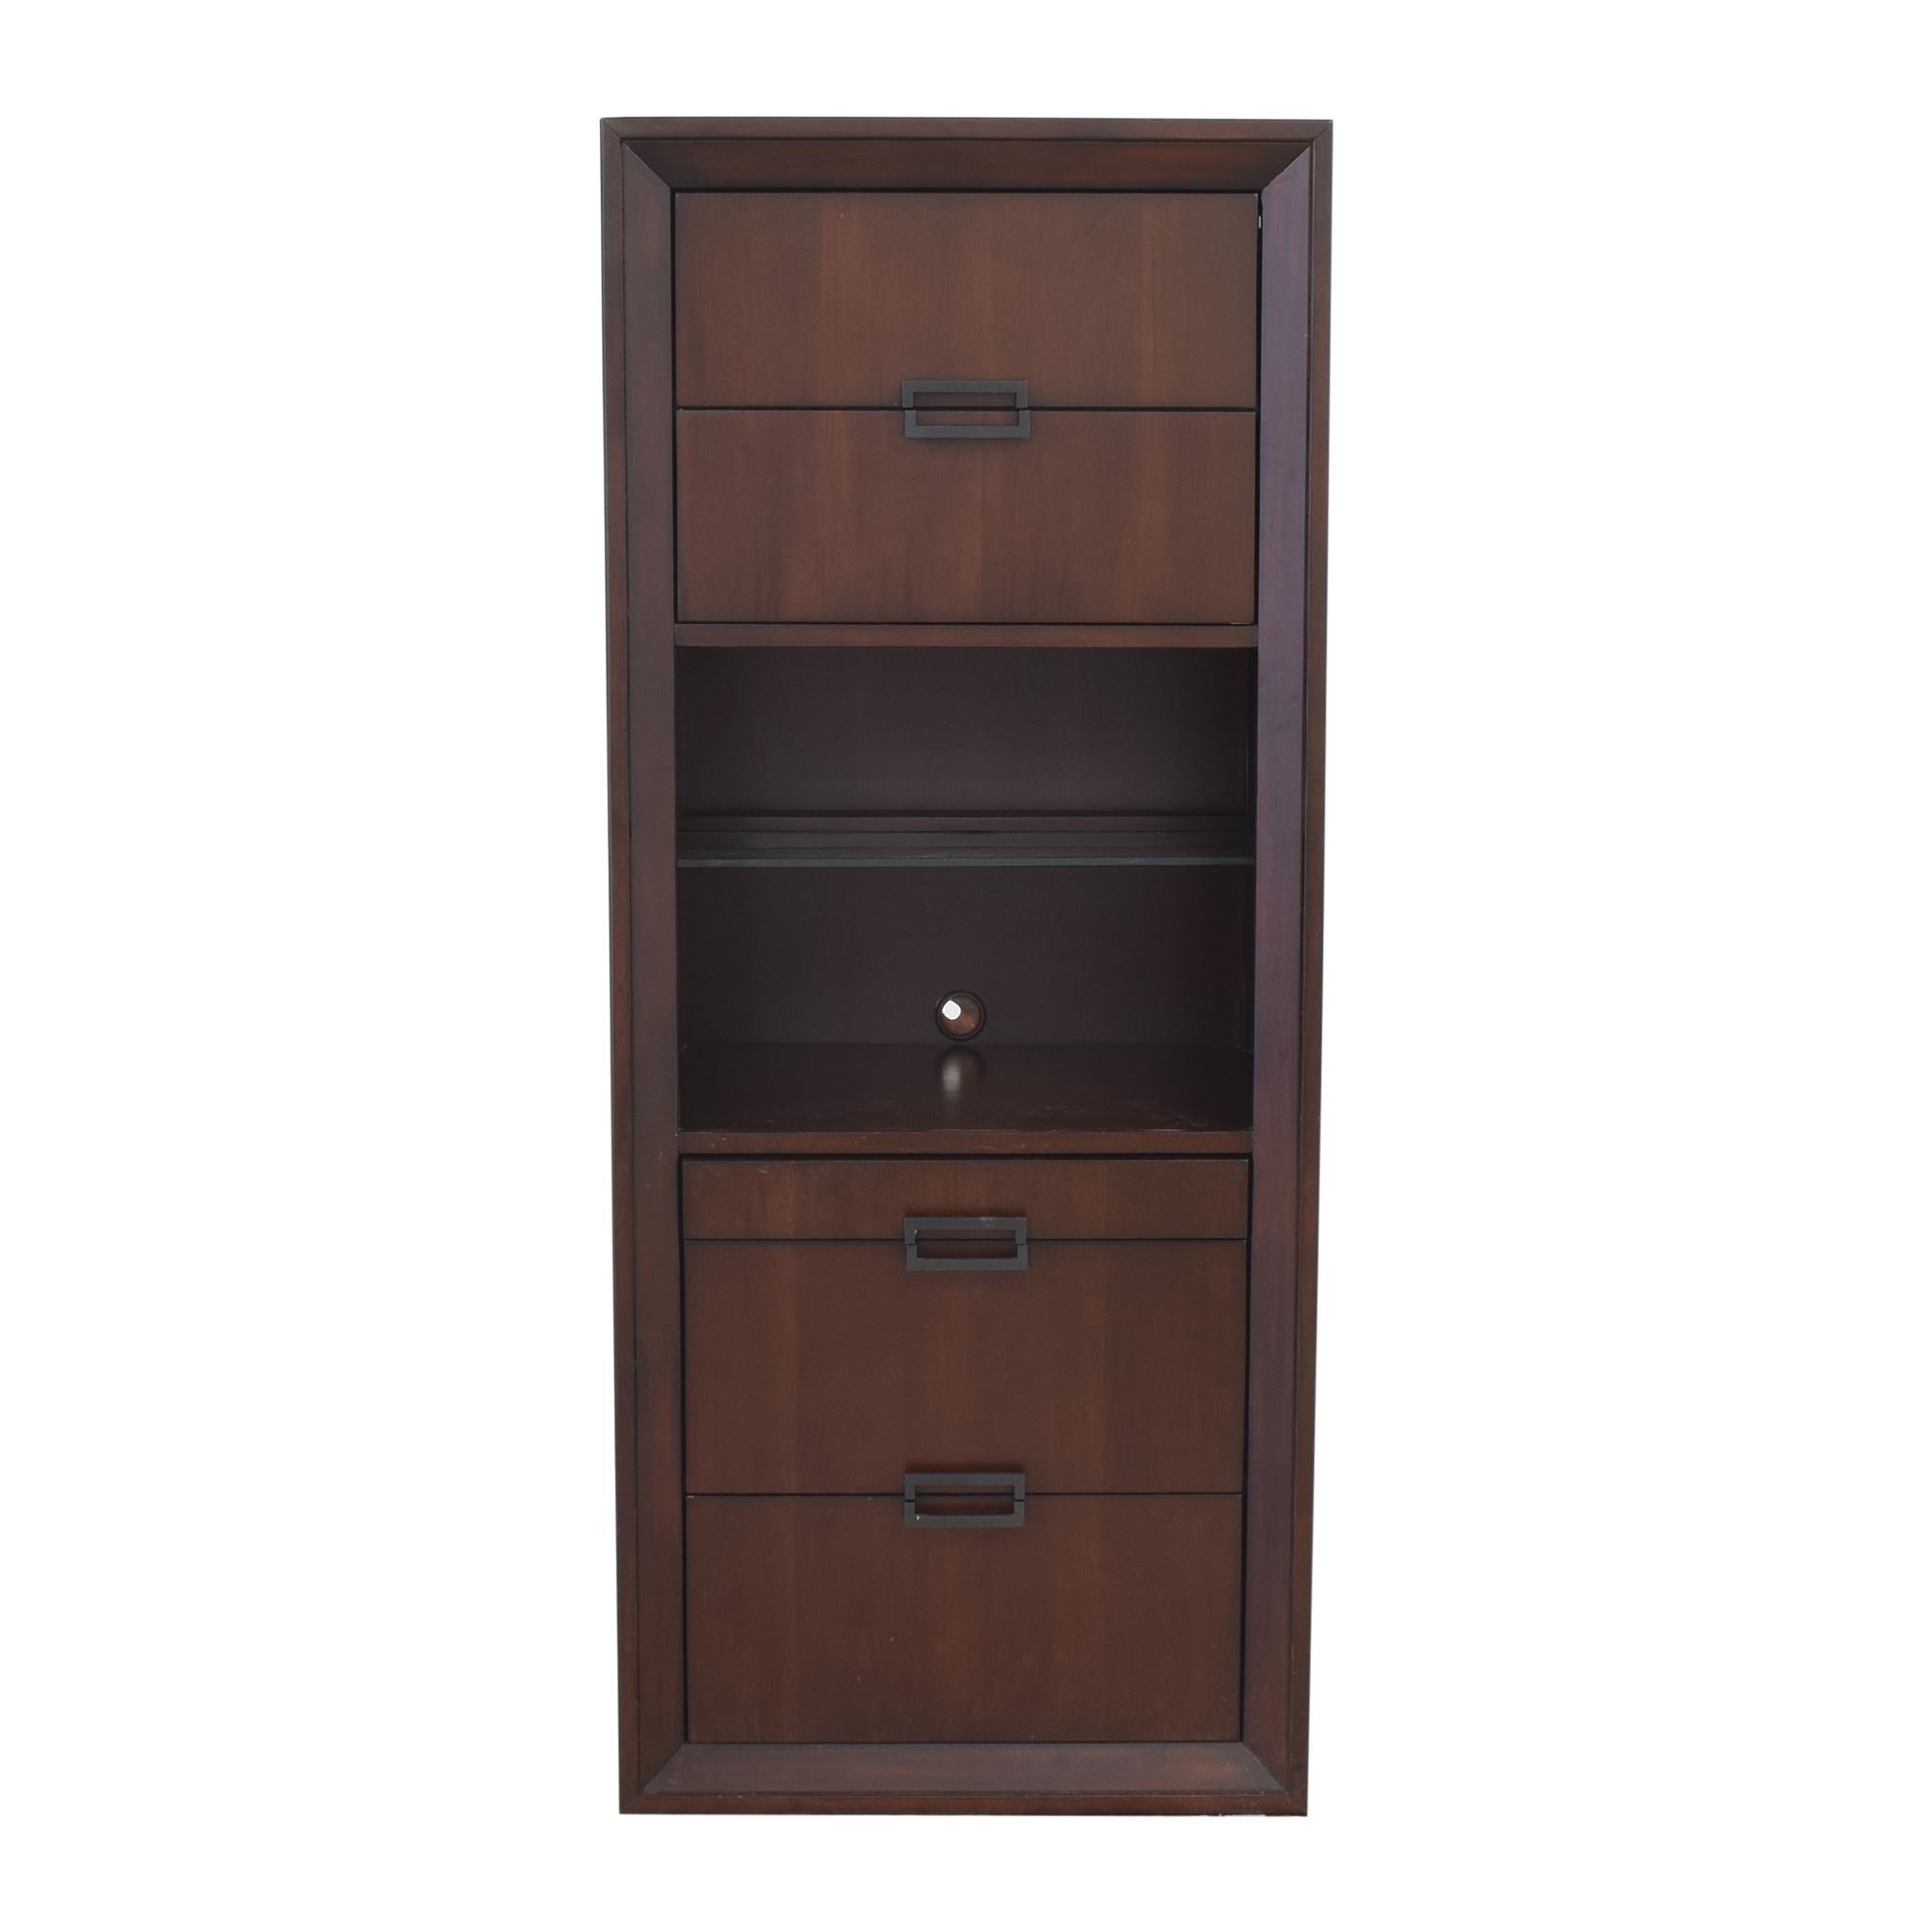 Raymour & Flanigan Vista Bedside Cabinet / Dressers